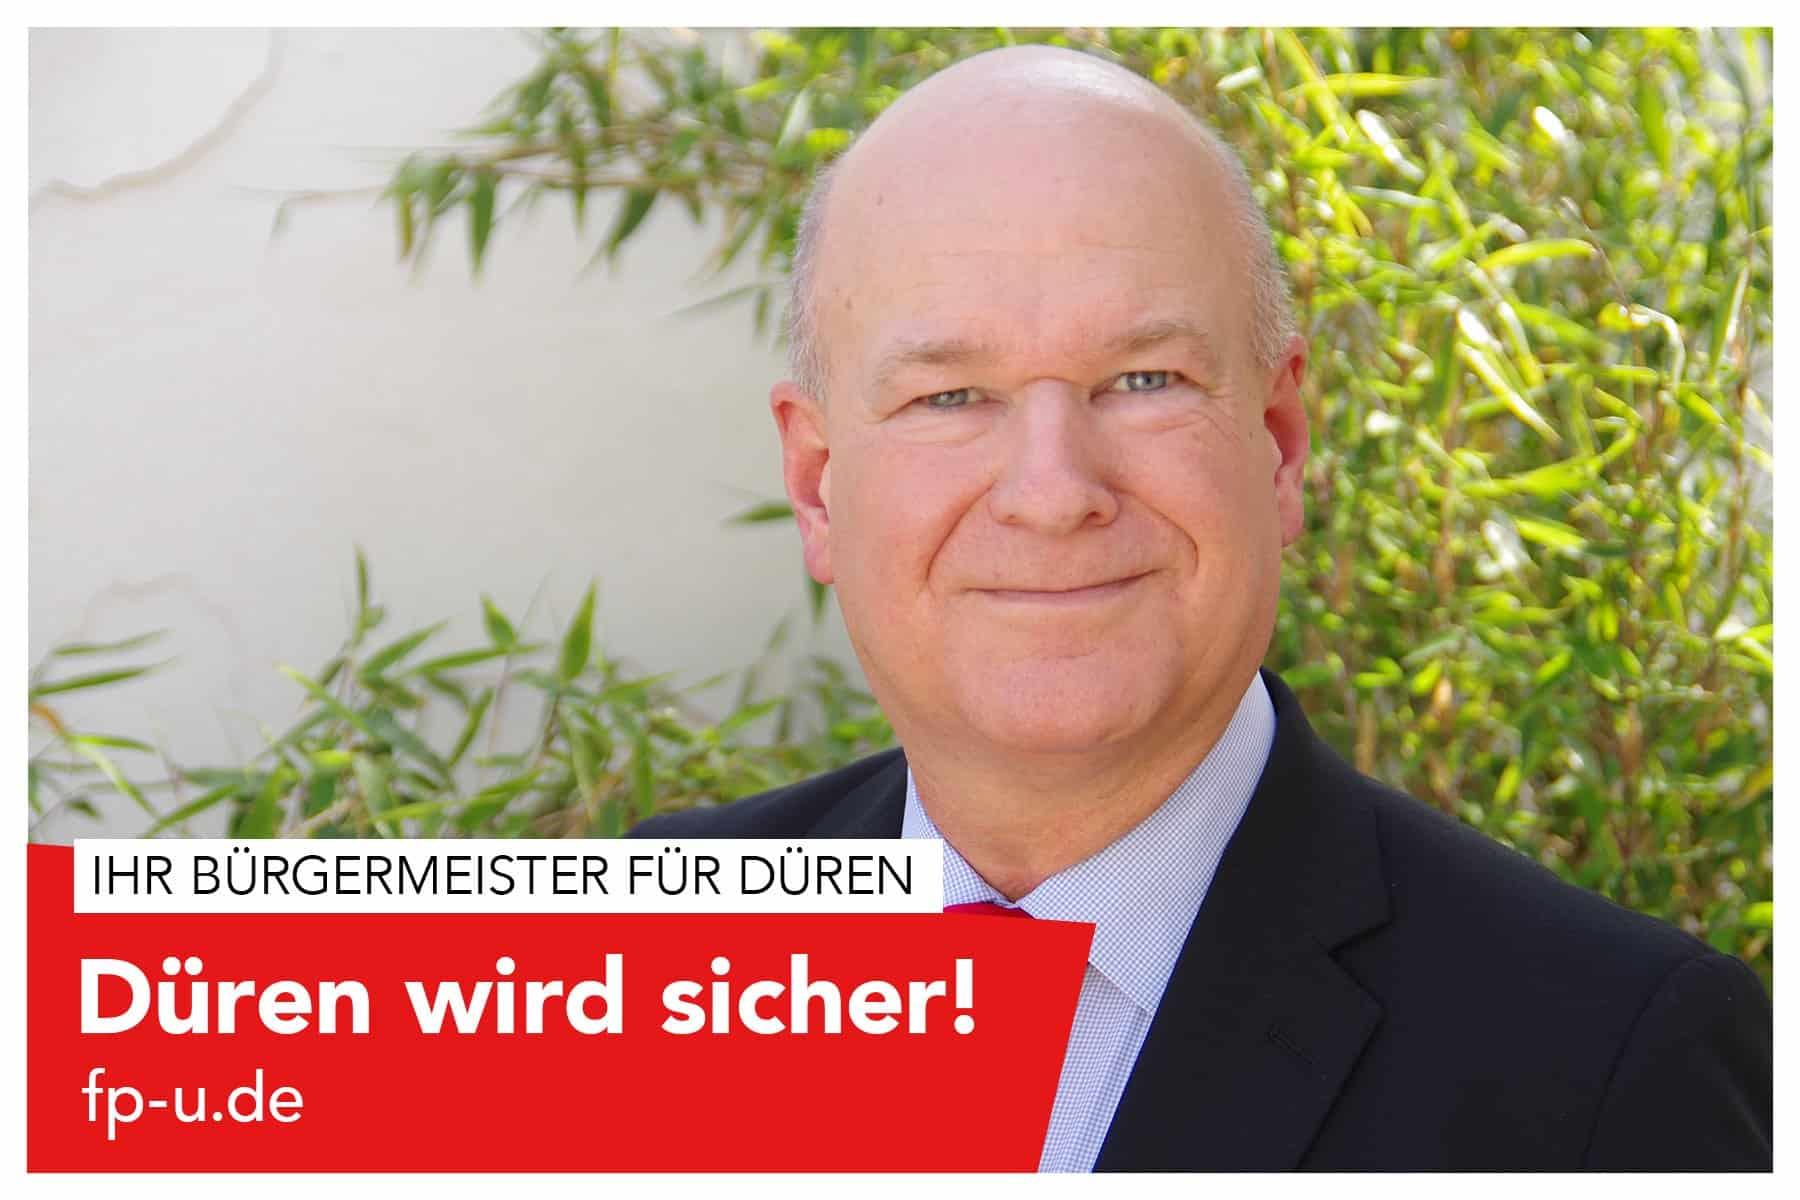 Frank Peter Ullrich Sicherheit